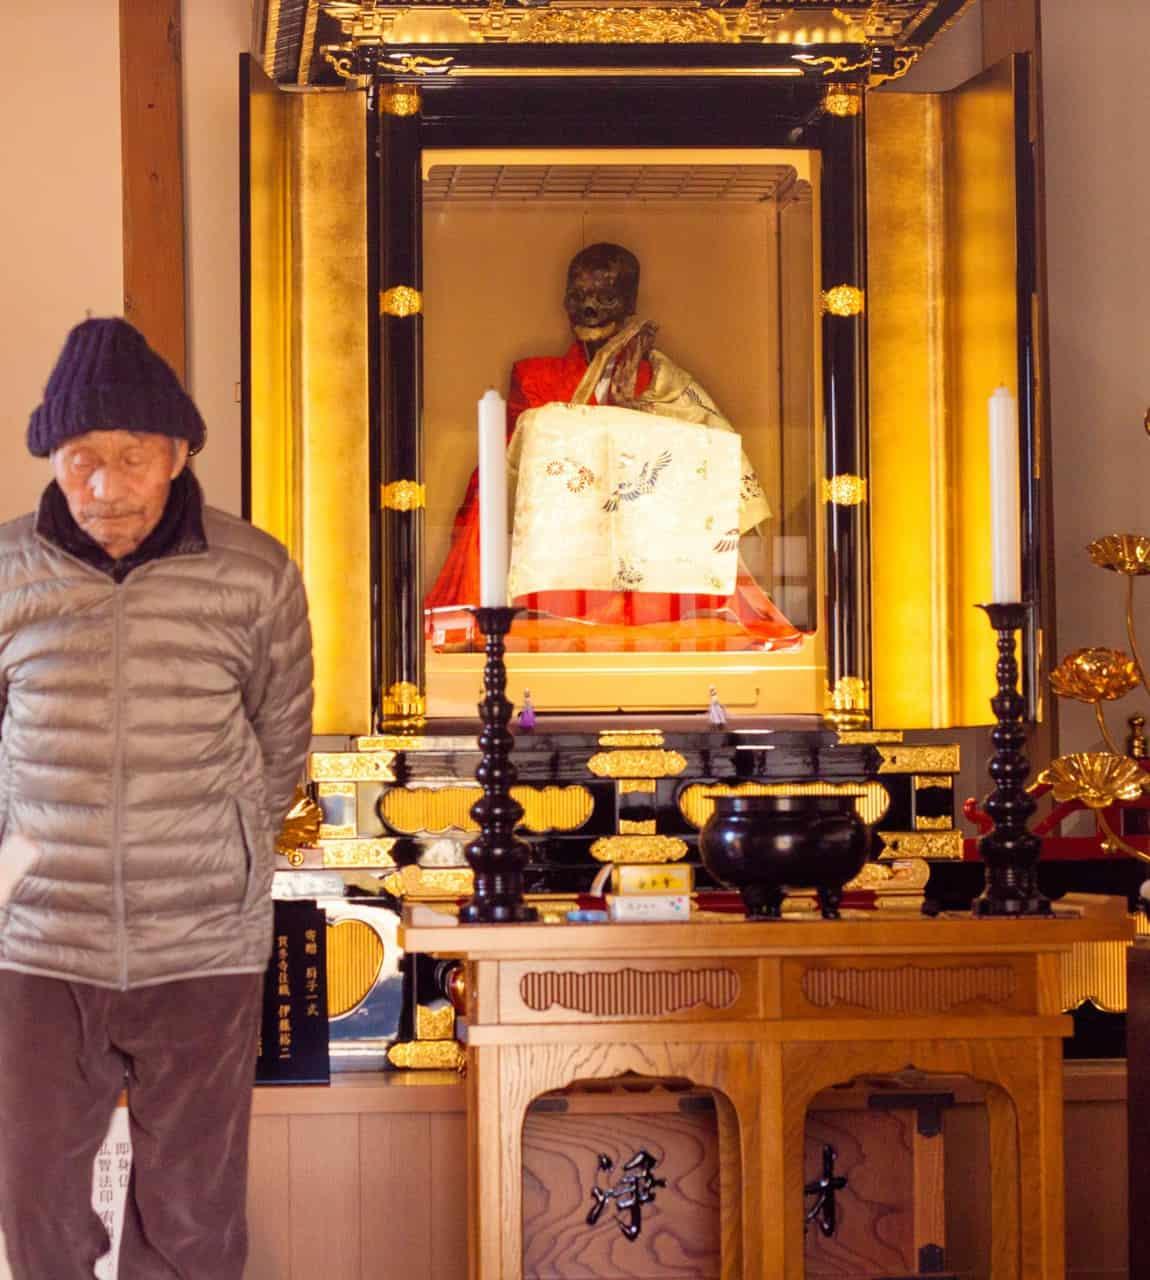 Kouchi Houin Yuutei at the temple in Fukushima prefecture